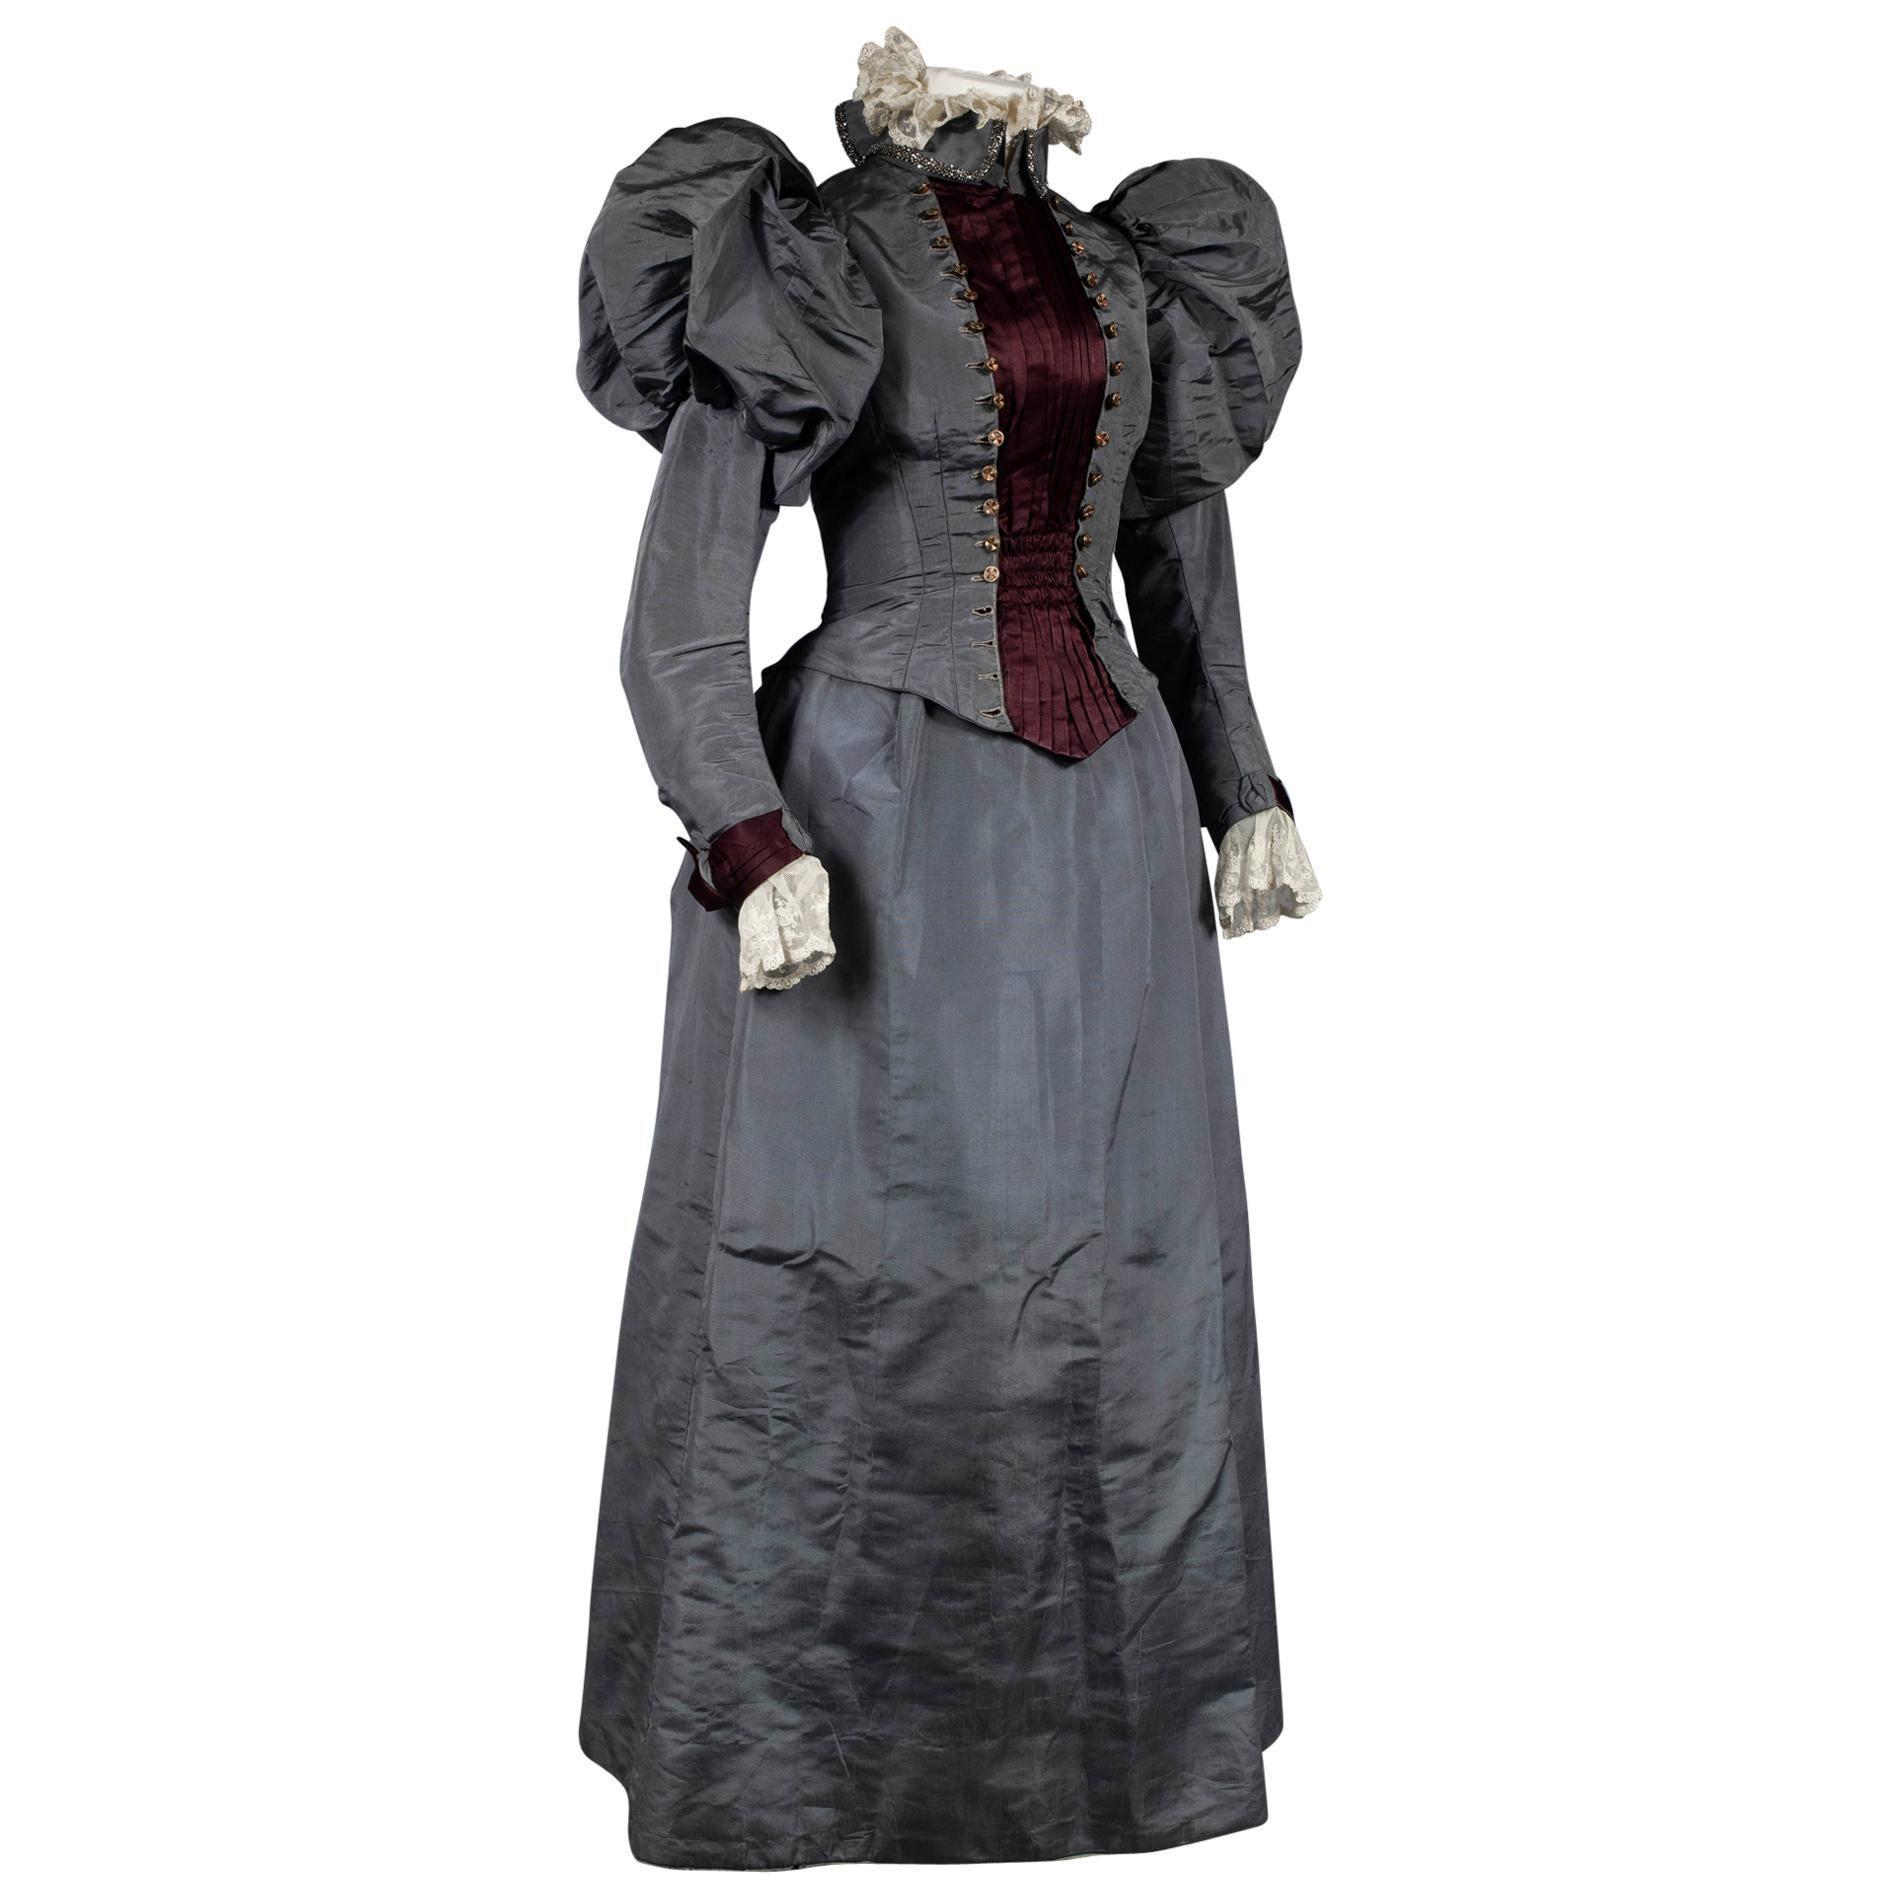 A Mutton Sleeves Silk Day Dress Edwardian Period Circa 1895